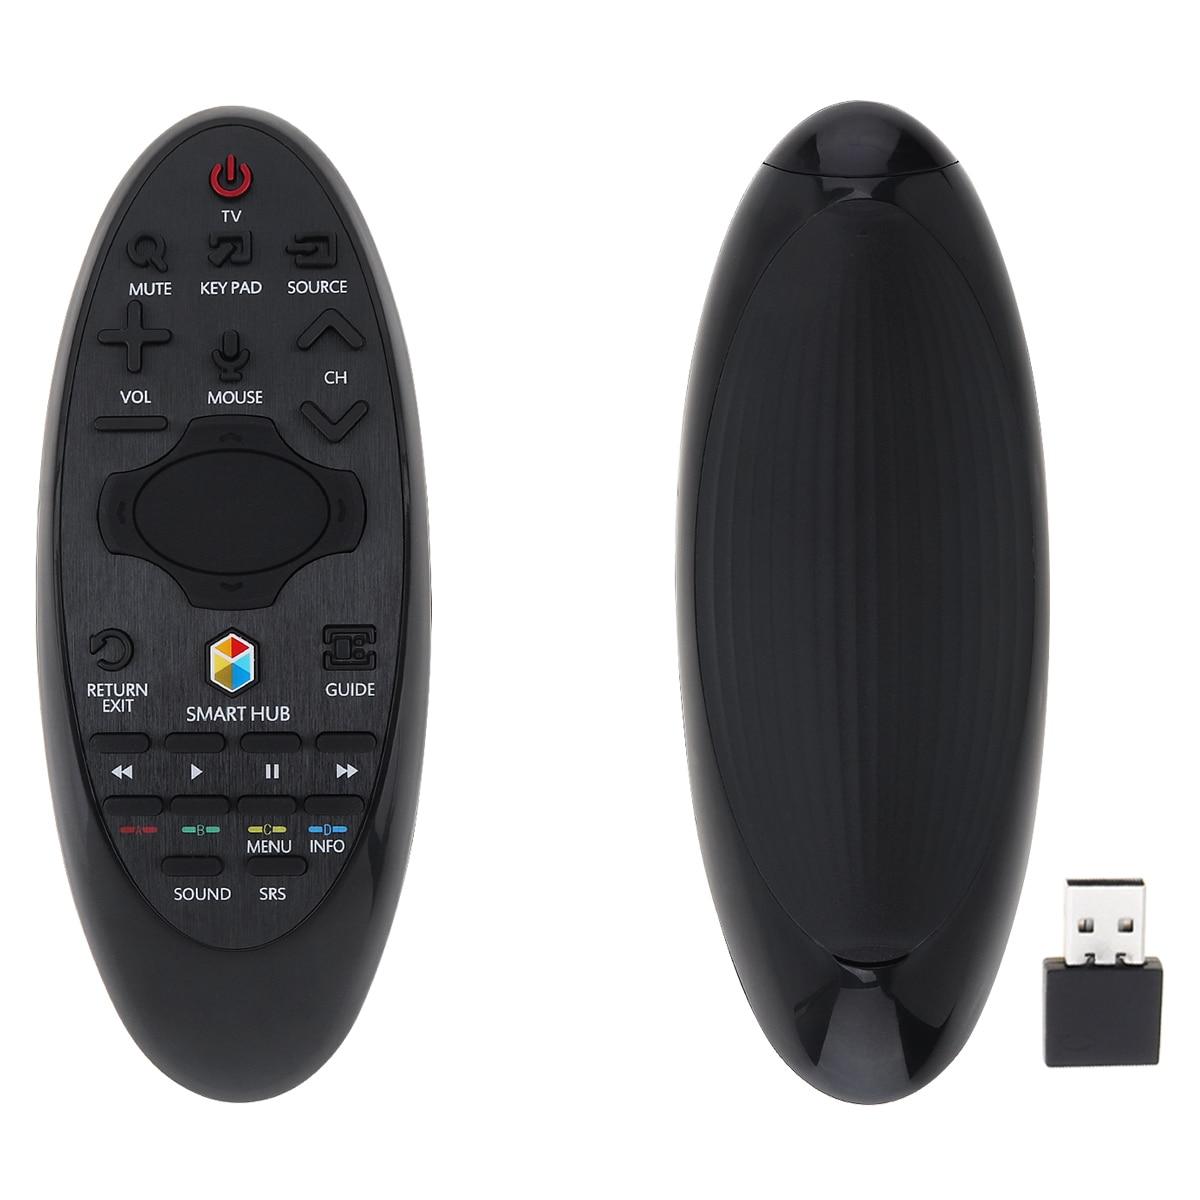 Control remoto IR YY-M601 Airmouse con USB y función de voz apto para Samsung TV BN59-01185D/BN59-01184D/BN59-01182D